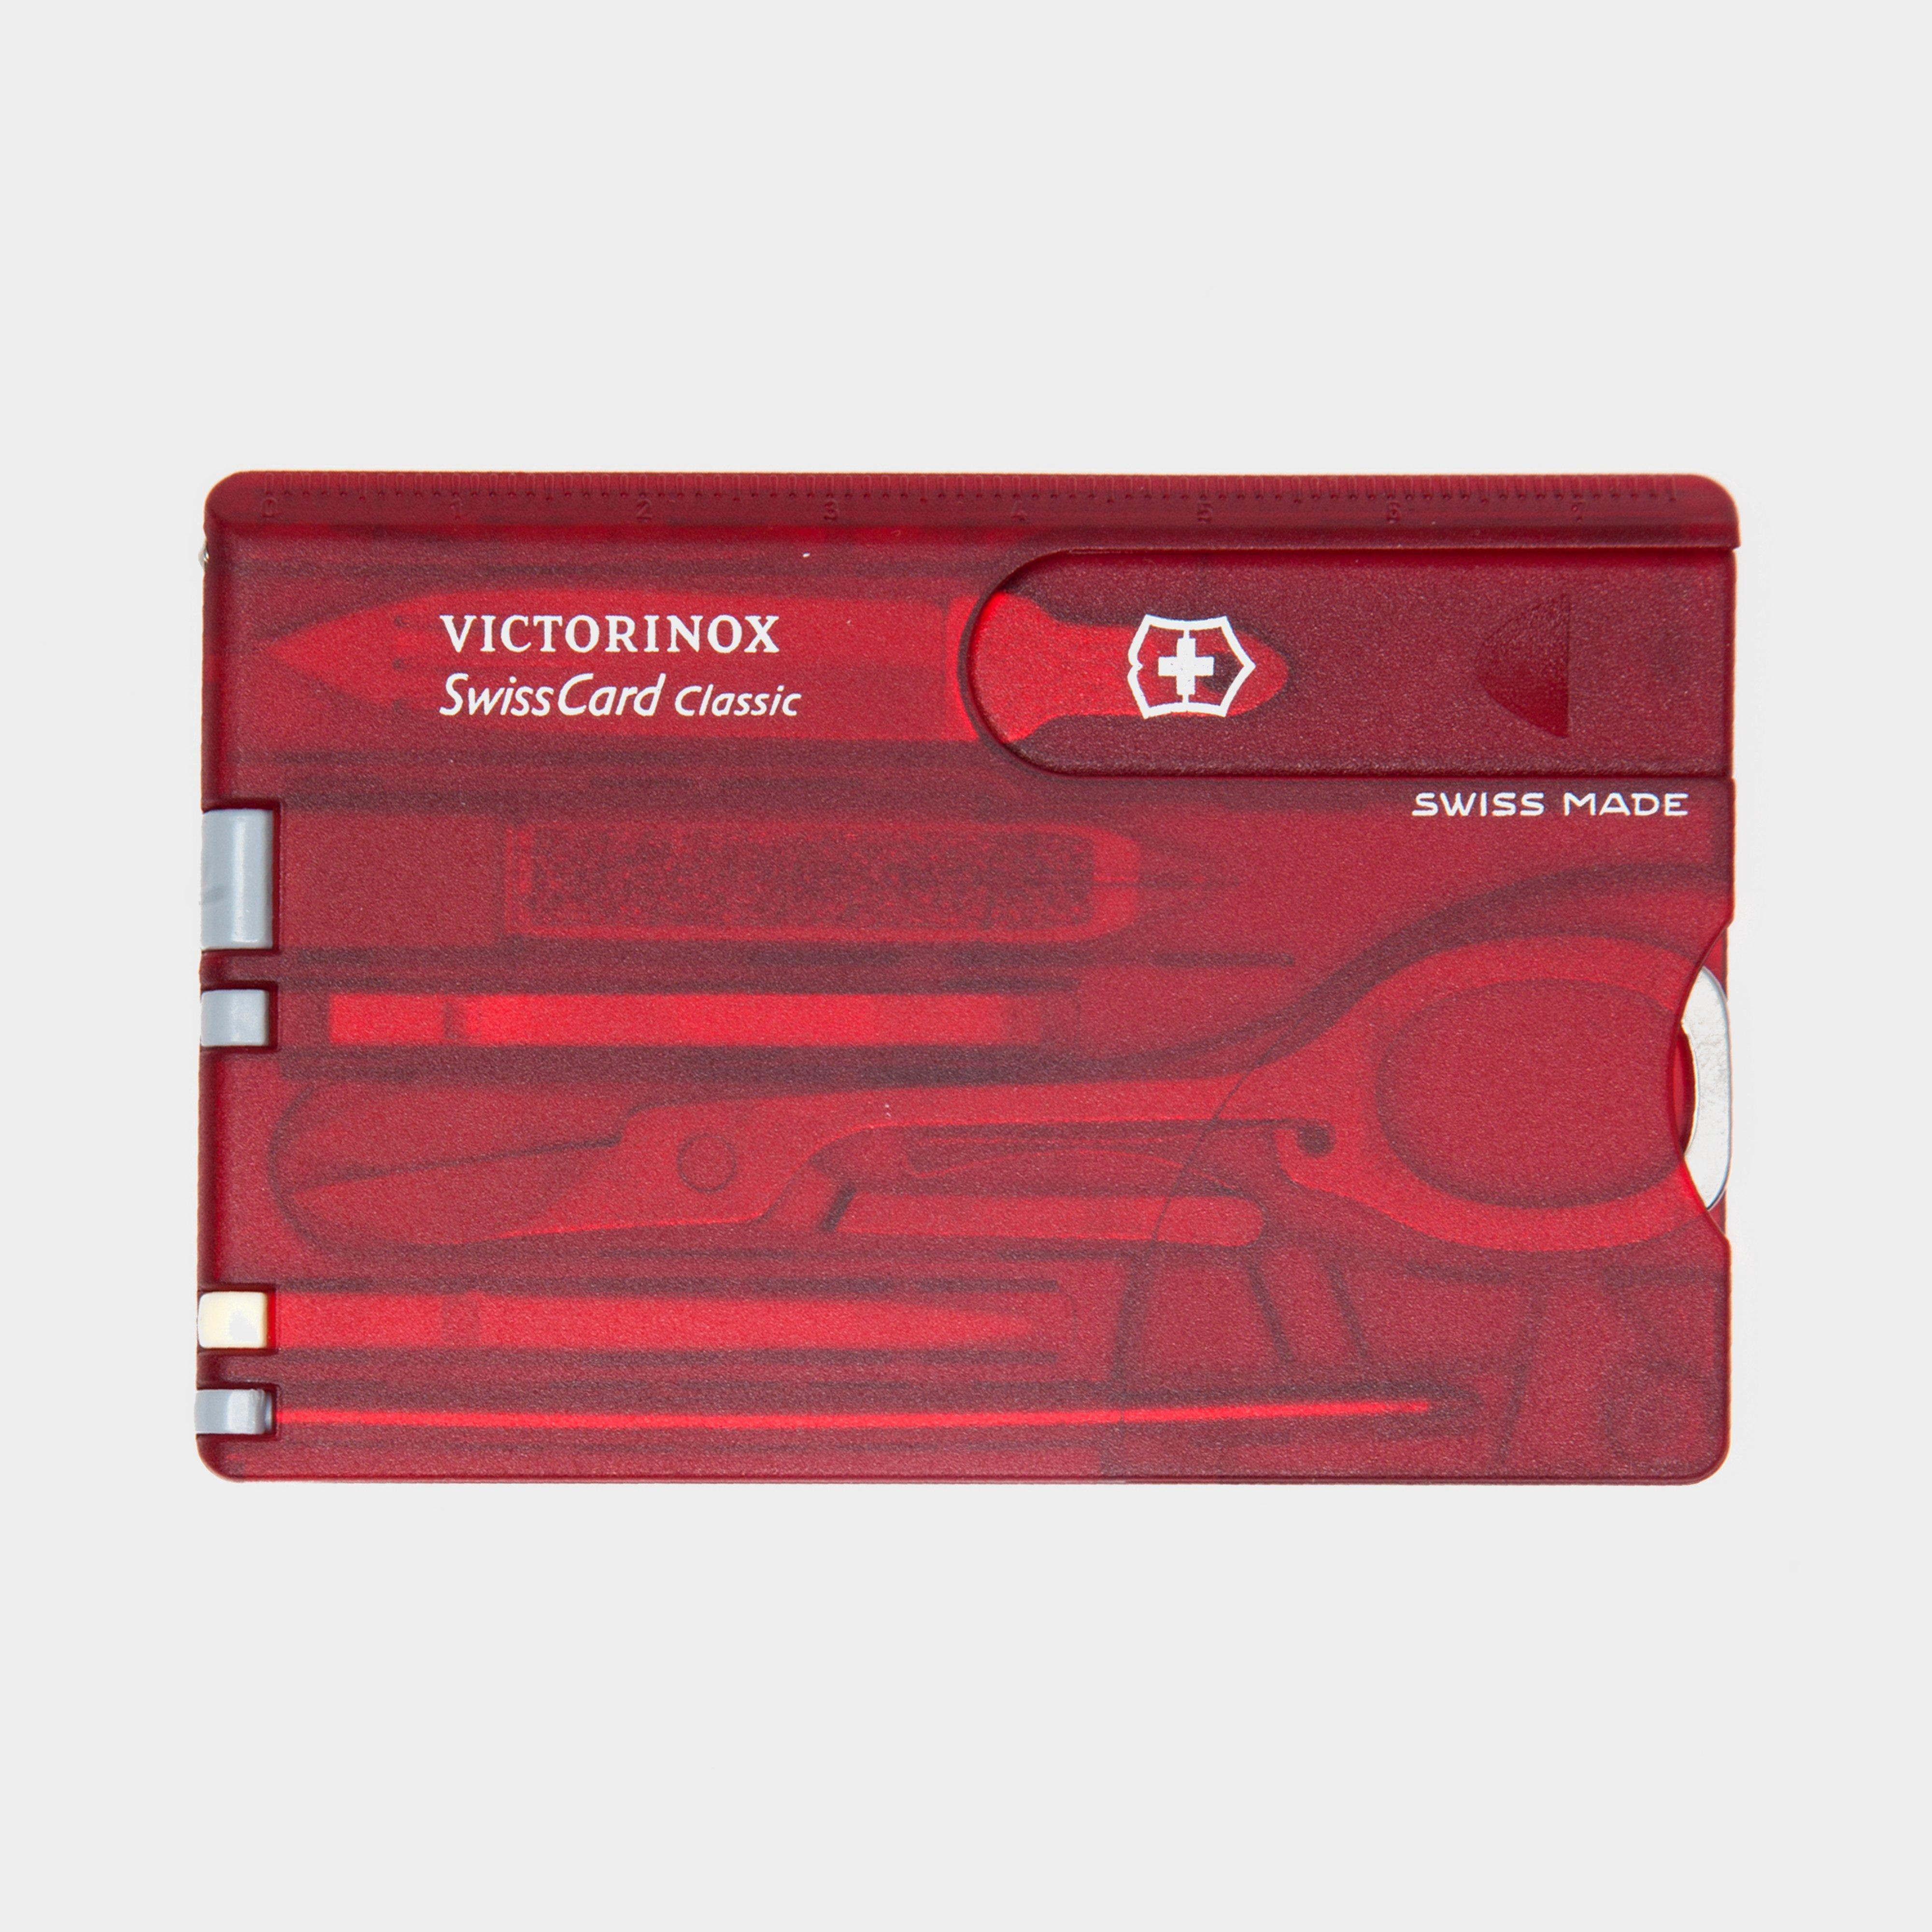 Victorinox Victorinox SwissCard Classic - Red, Red